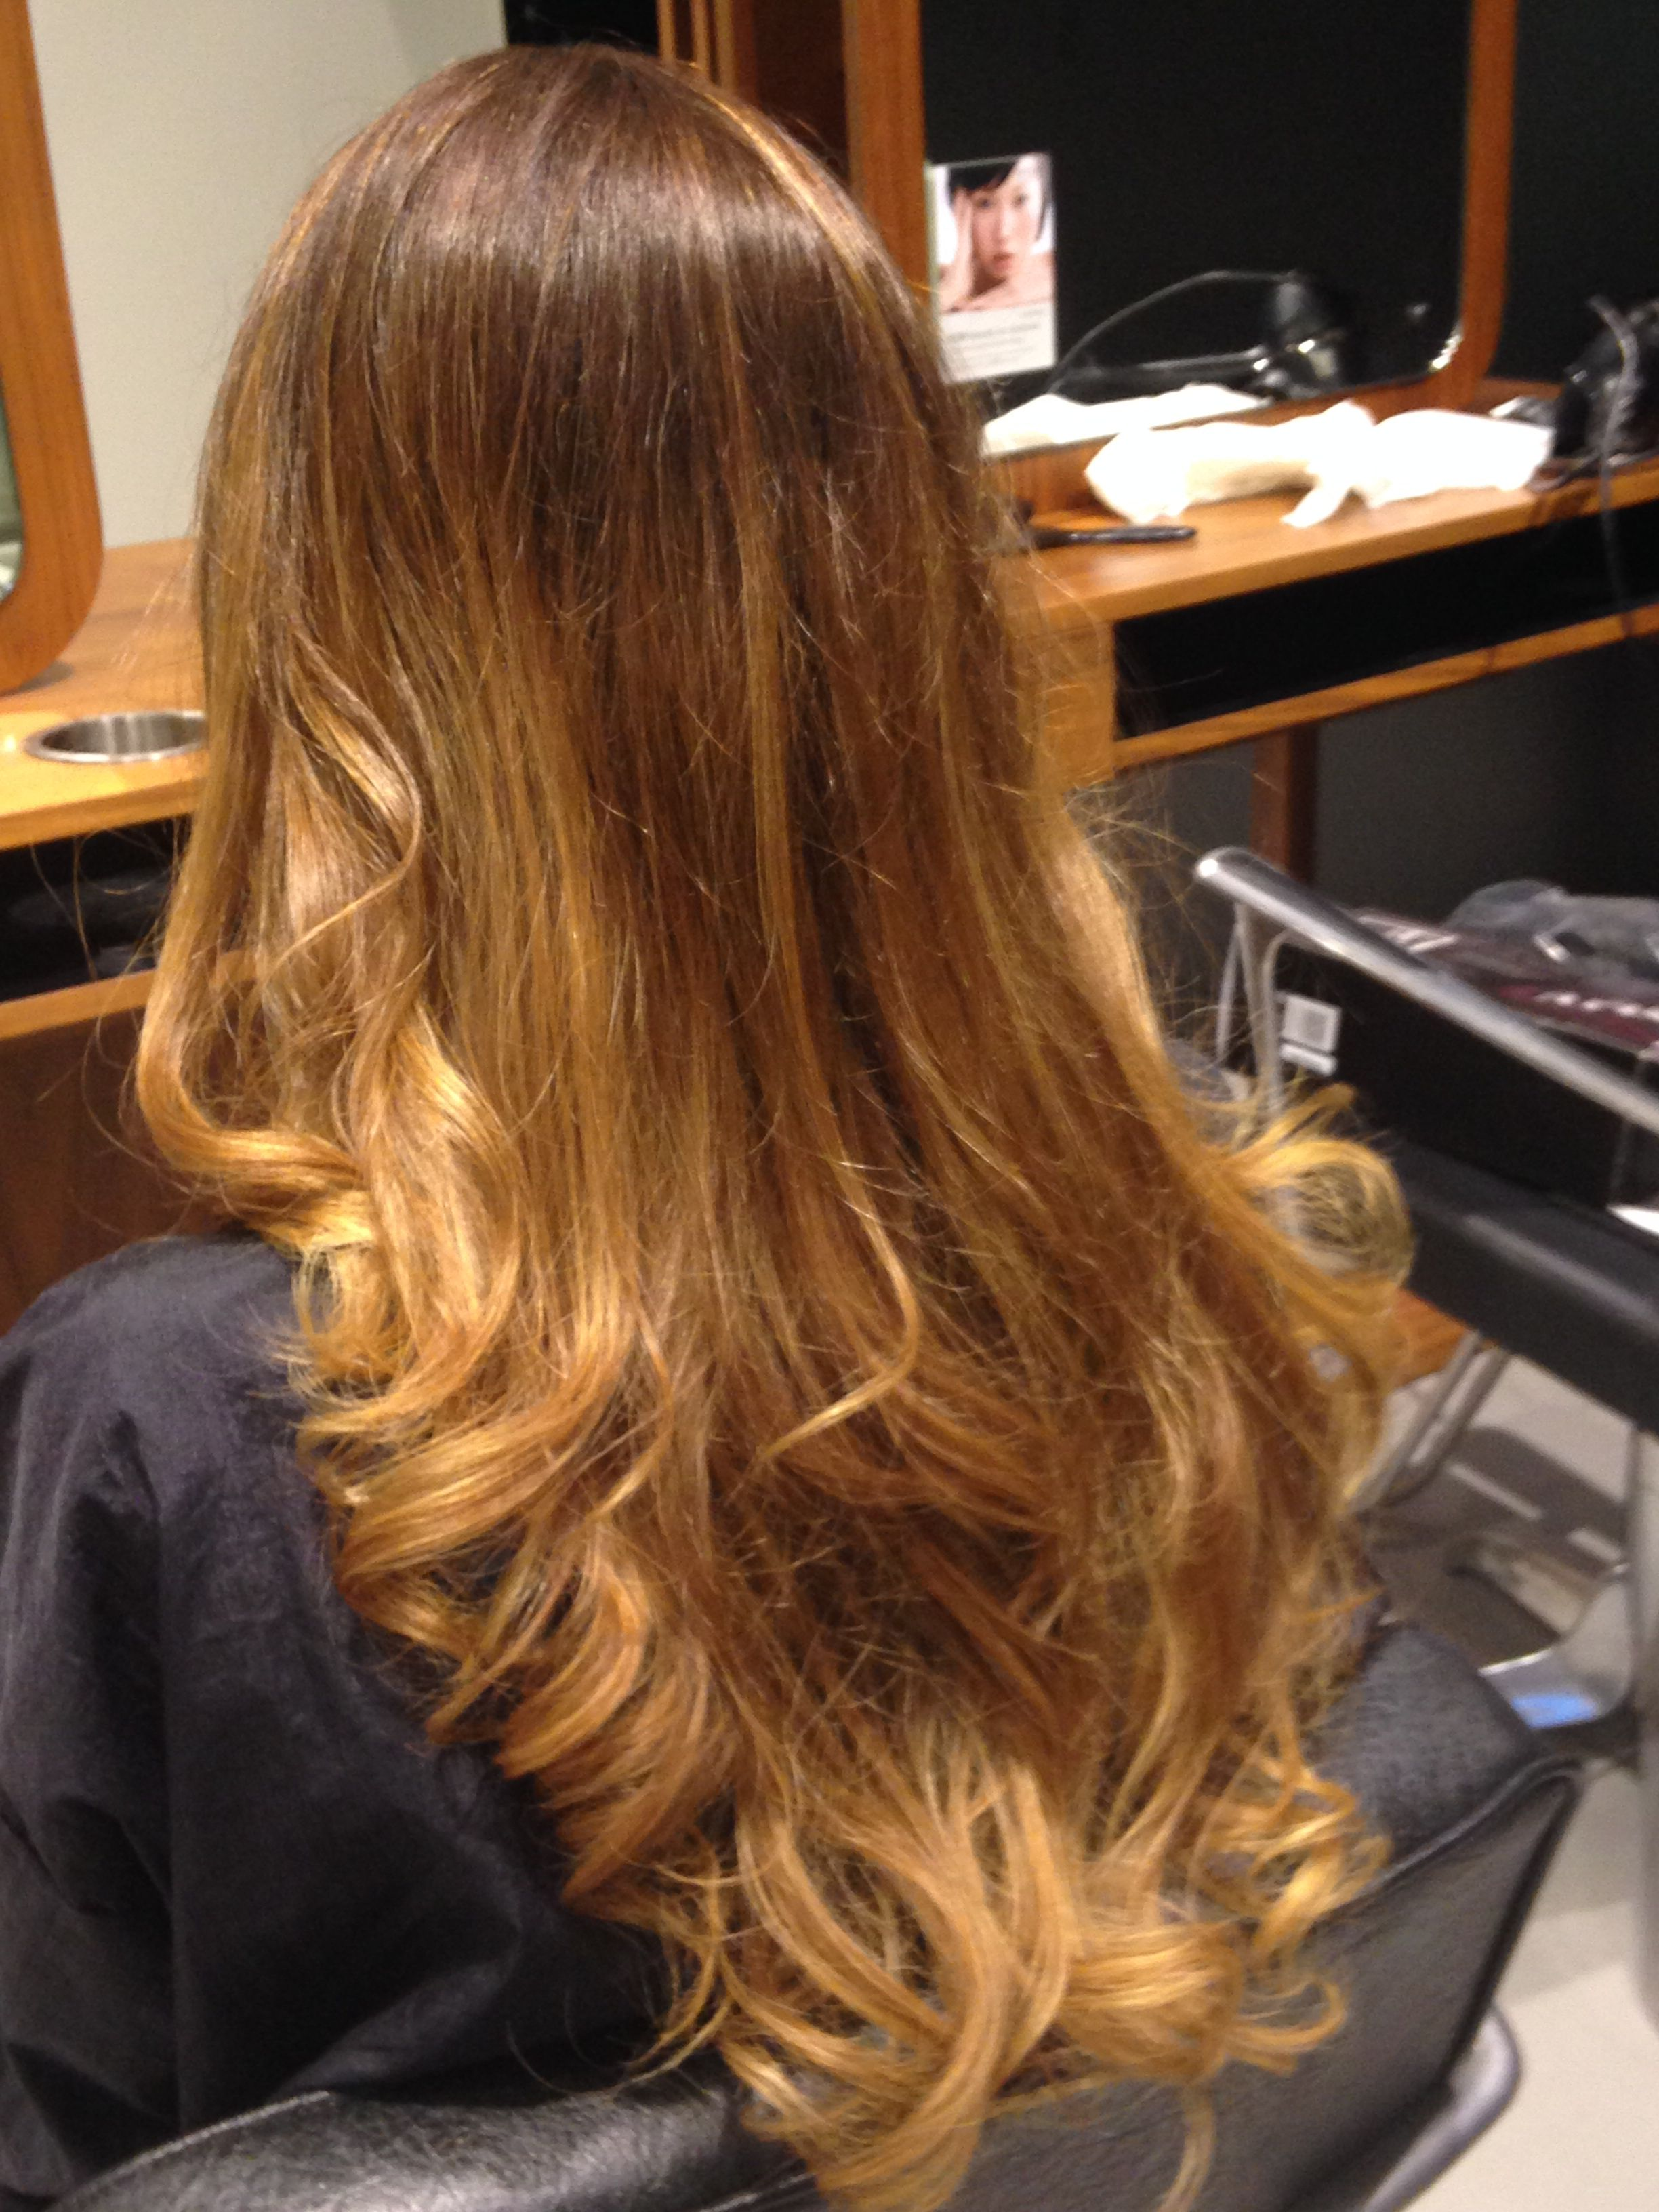 Ballayage Blond en ce qui concerne ballayage #aveda #naturallights #cardiffhair #ontrend | #ballayage